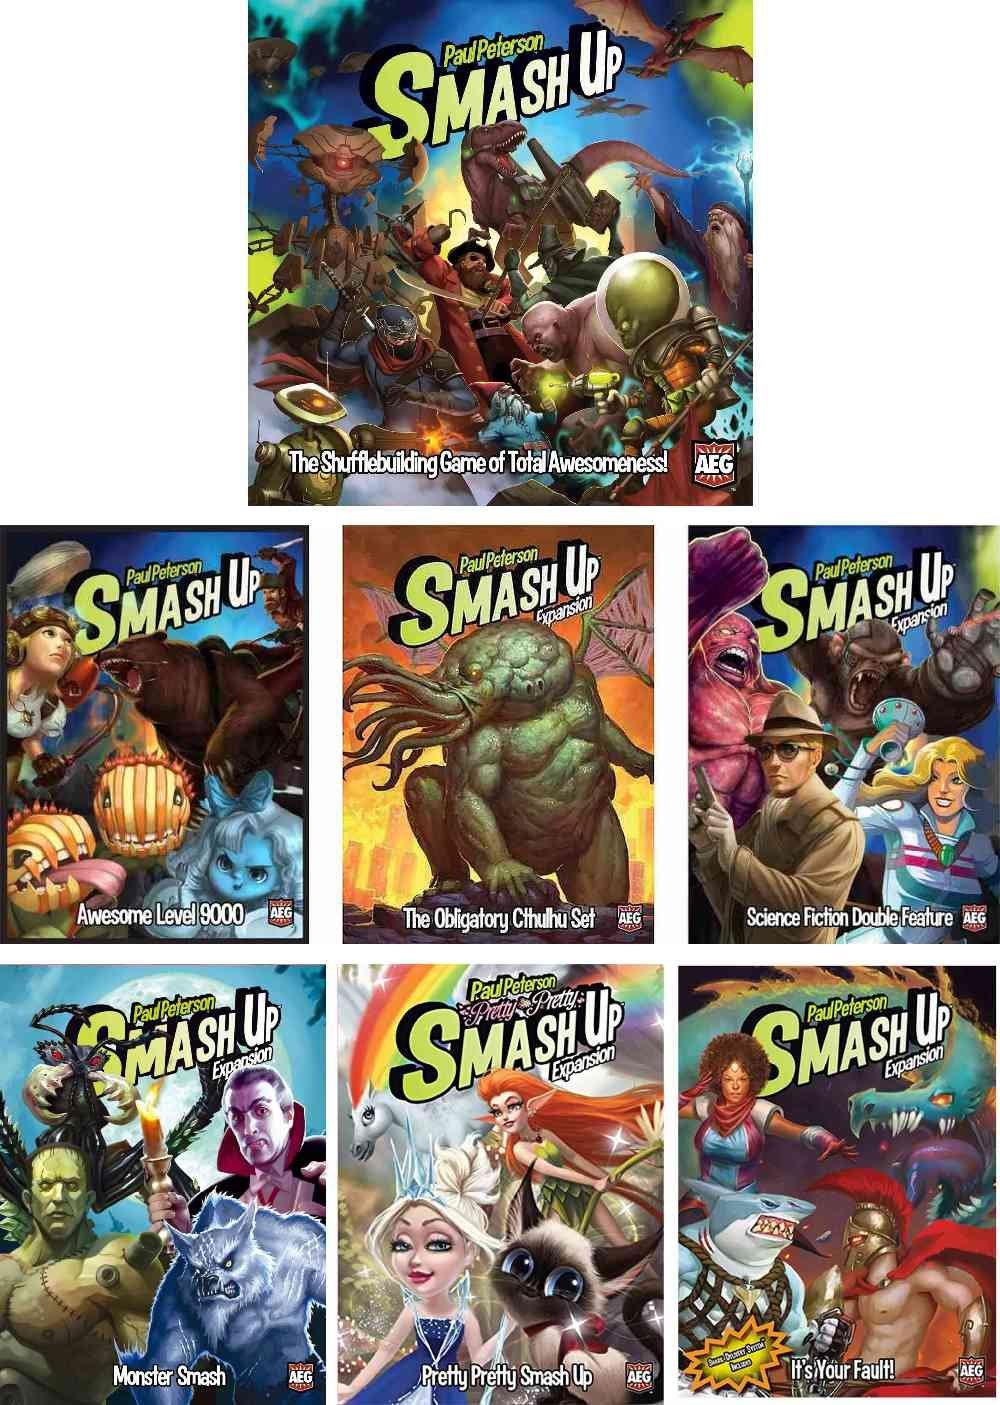 Smash Up Bundle of Base Card Game plus 6 Expansions